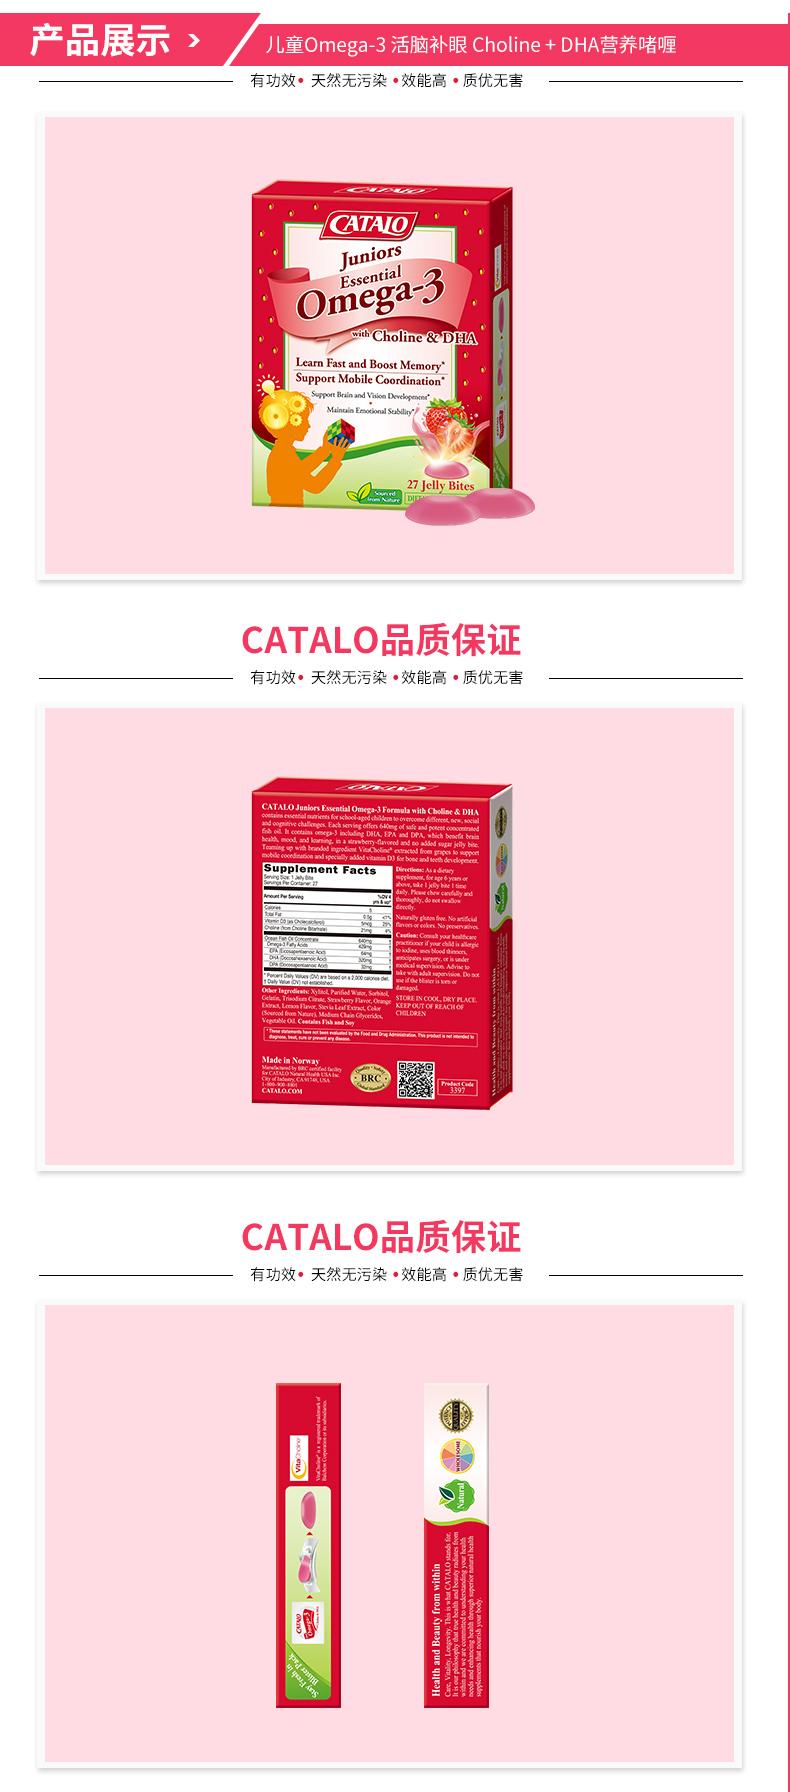 CATALO挪威进口儿童dha奥米加3营养啫喱 【1000积分+99元】换购 产品系列 第6张